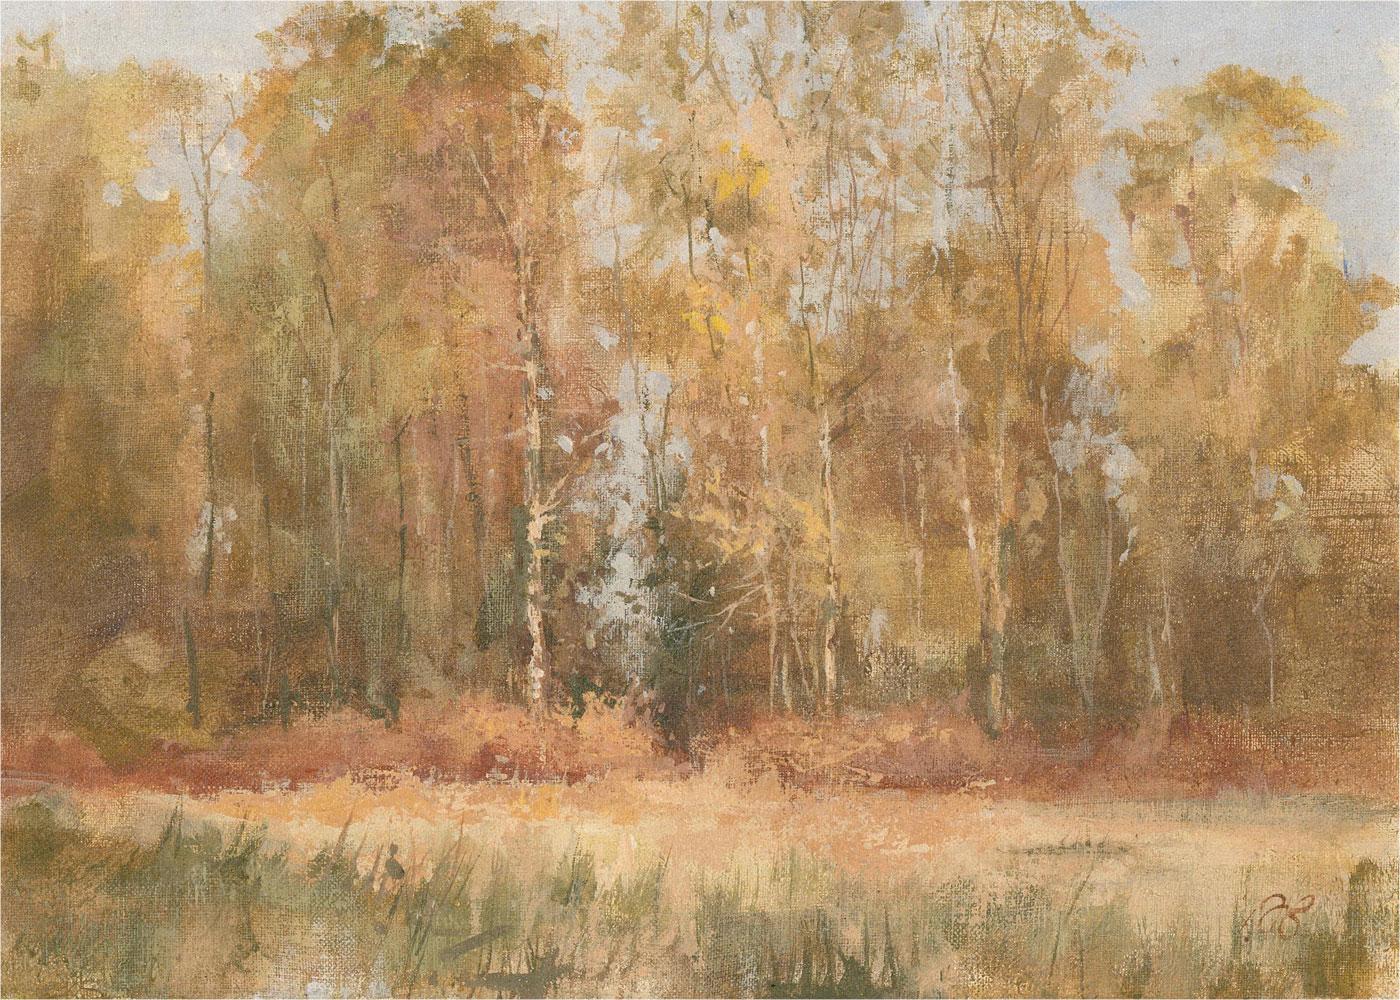 A.B. - 20th Century Oil, Winter Sunshine, Headley Heath